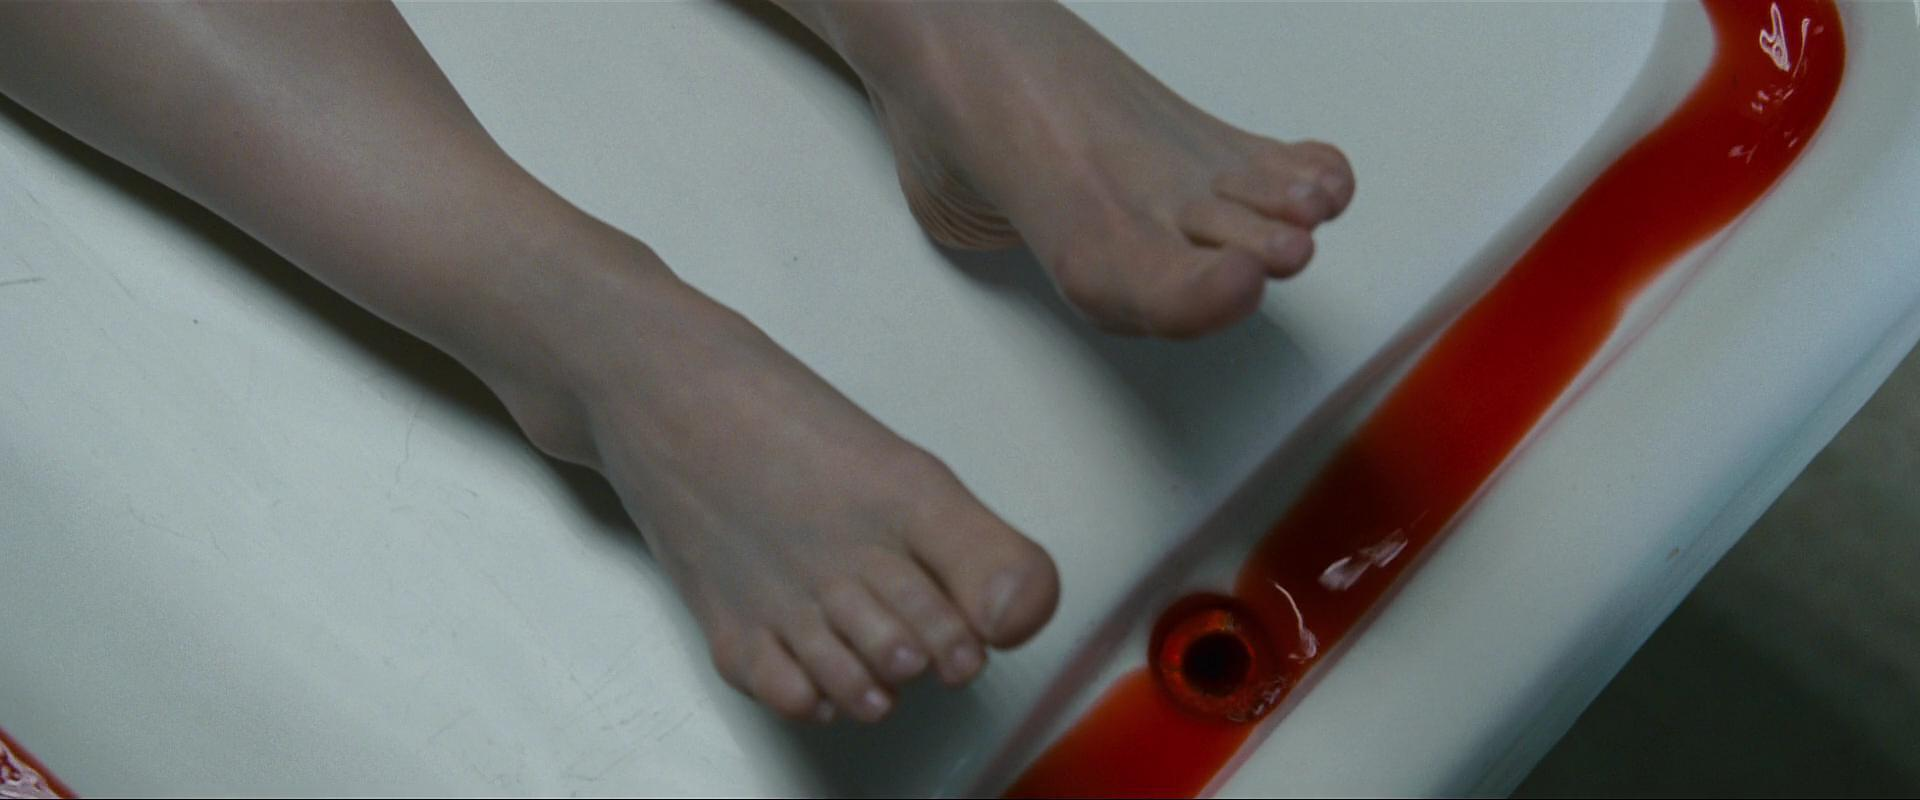 Foot Leg Riccas Sexy